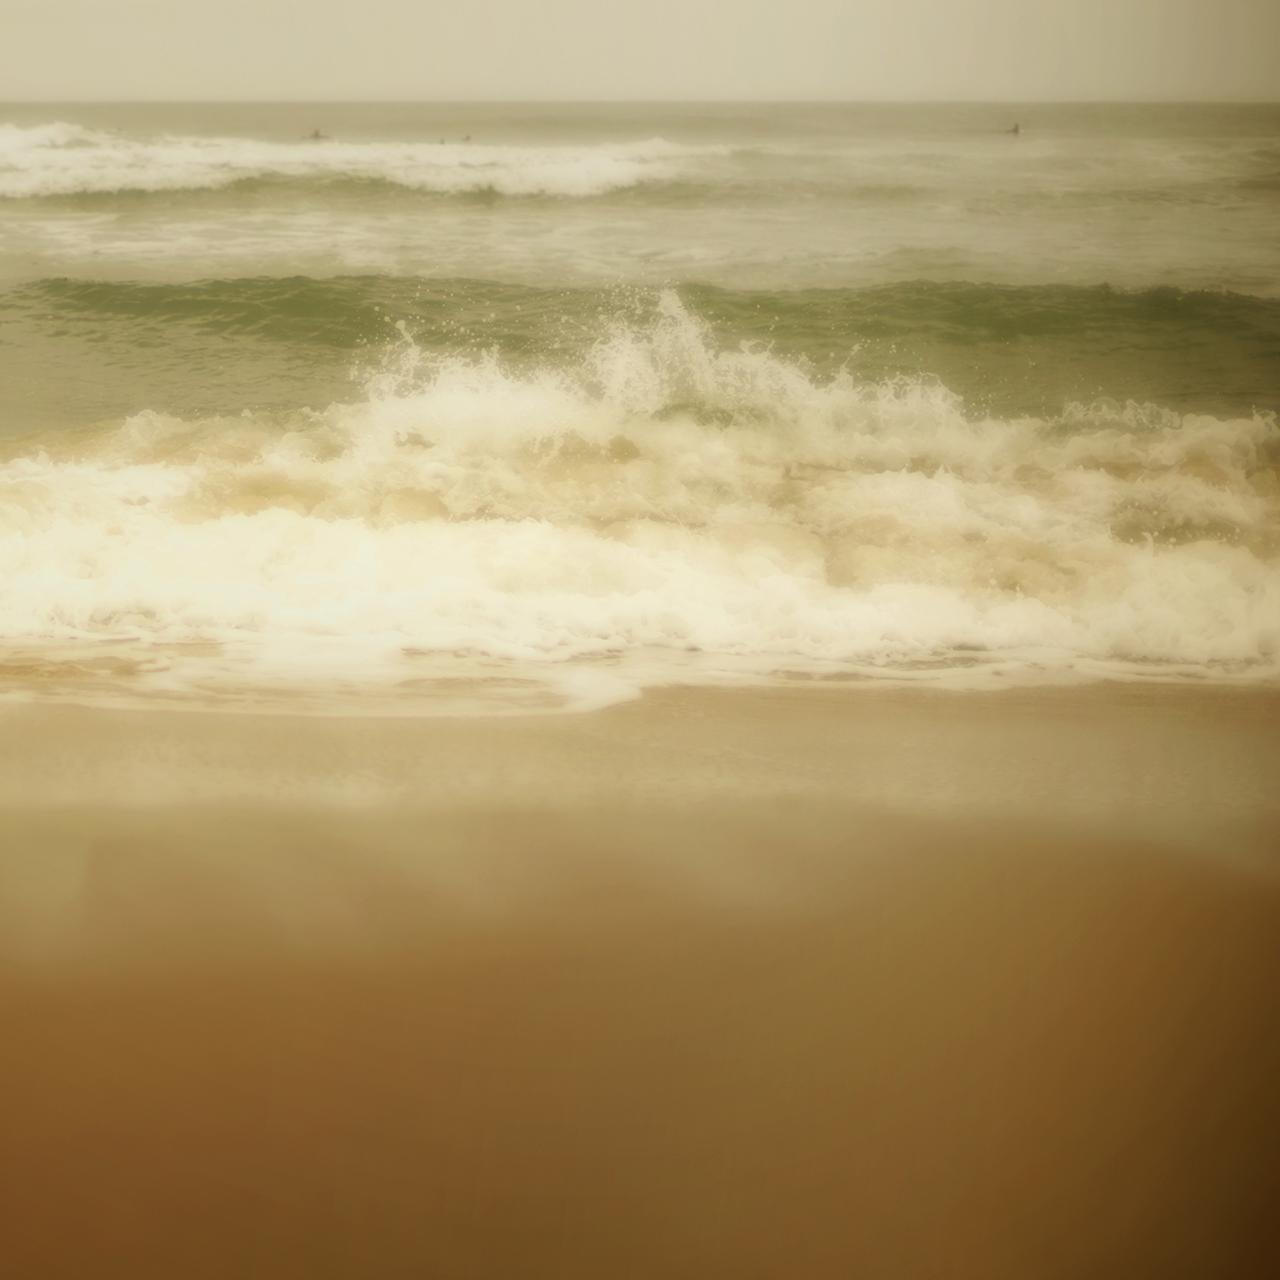 The-wave-2sur2-julien-baillargeon-2017-web.jpg